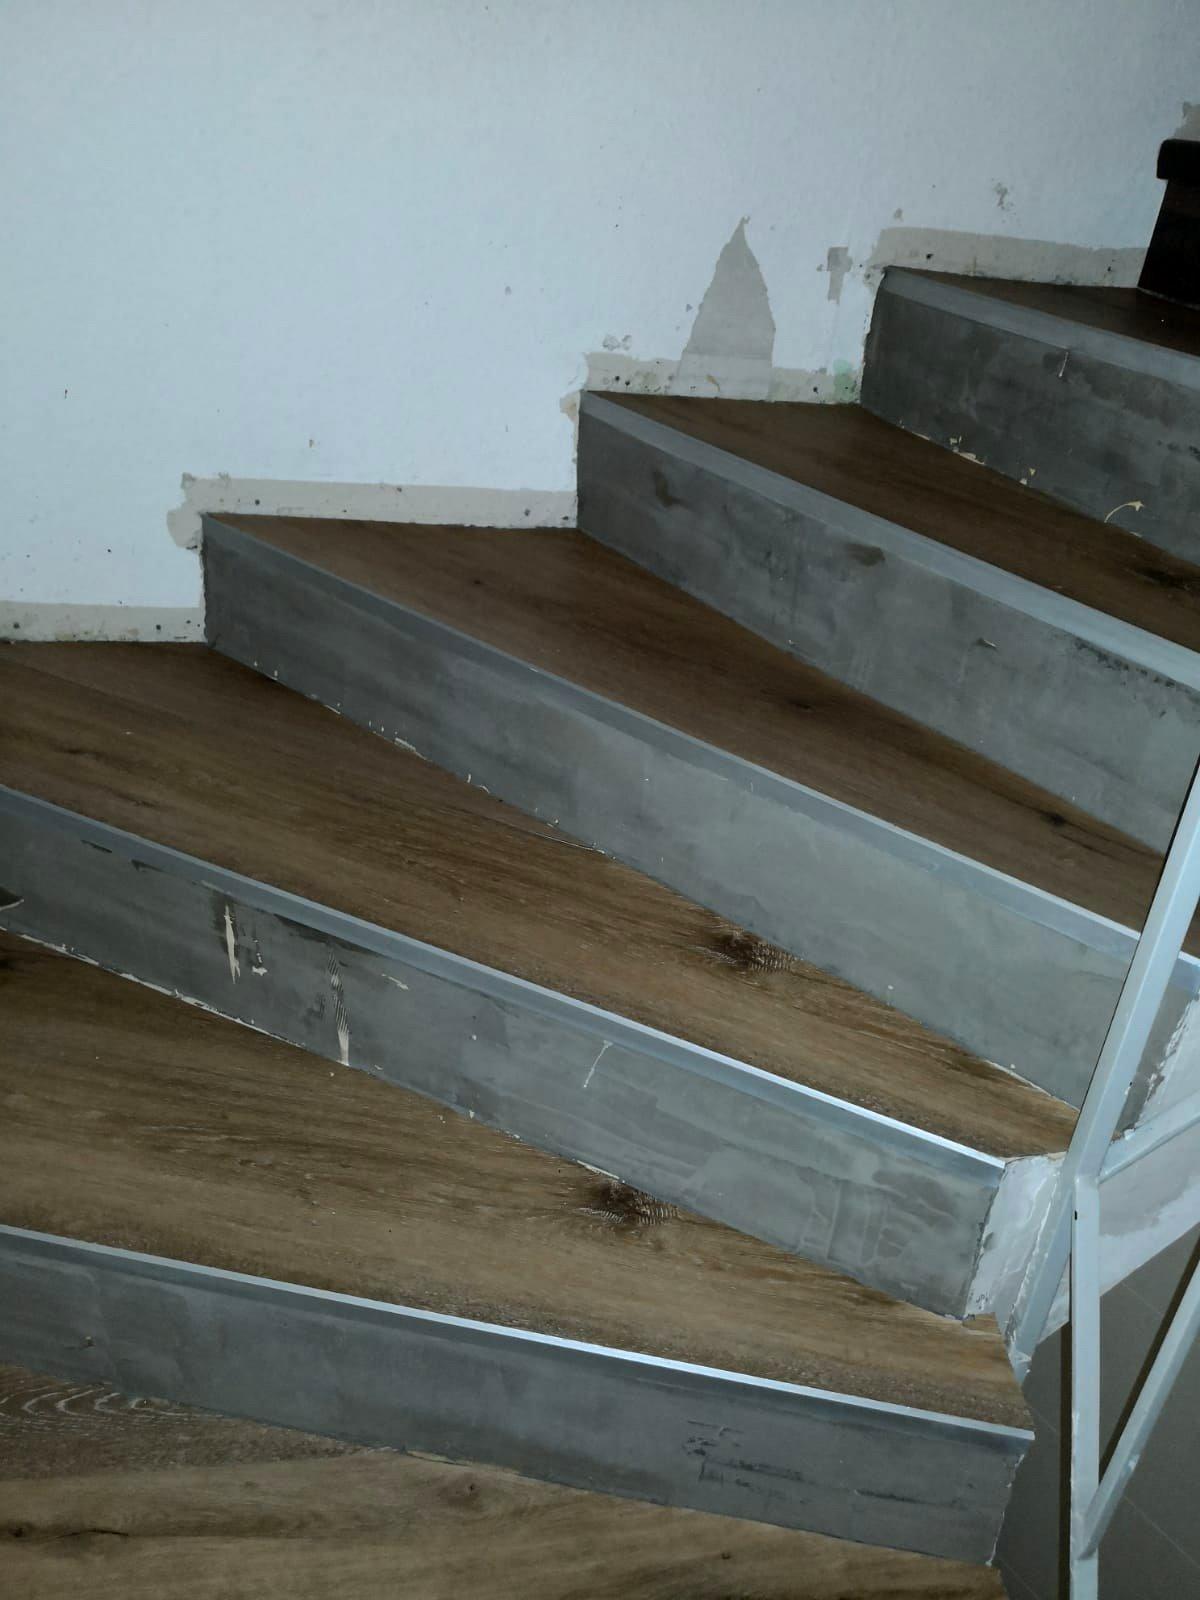 Mandic Baudekoration Treppe Bodenbelag (5)